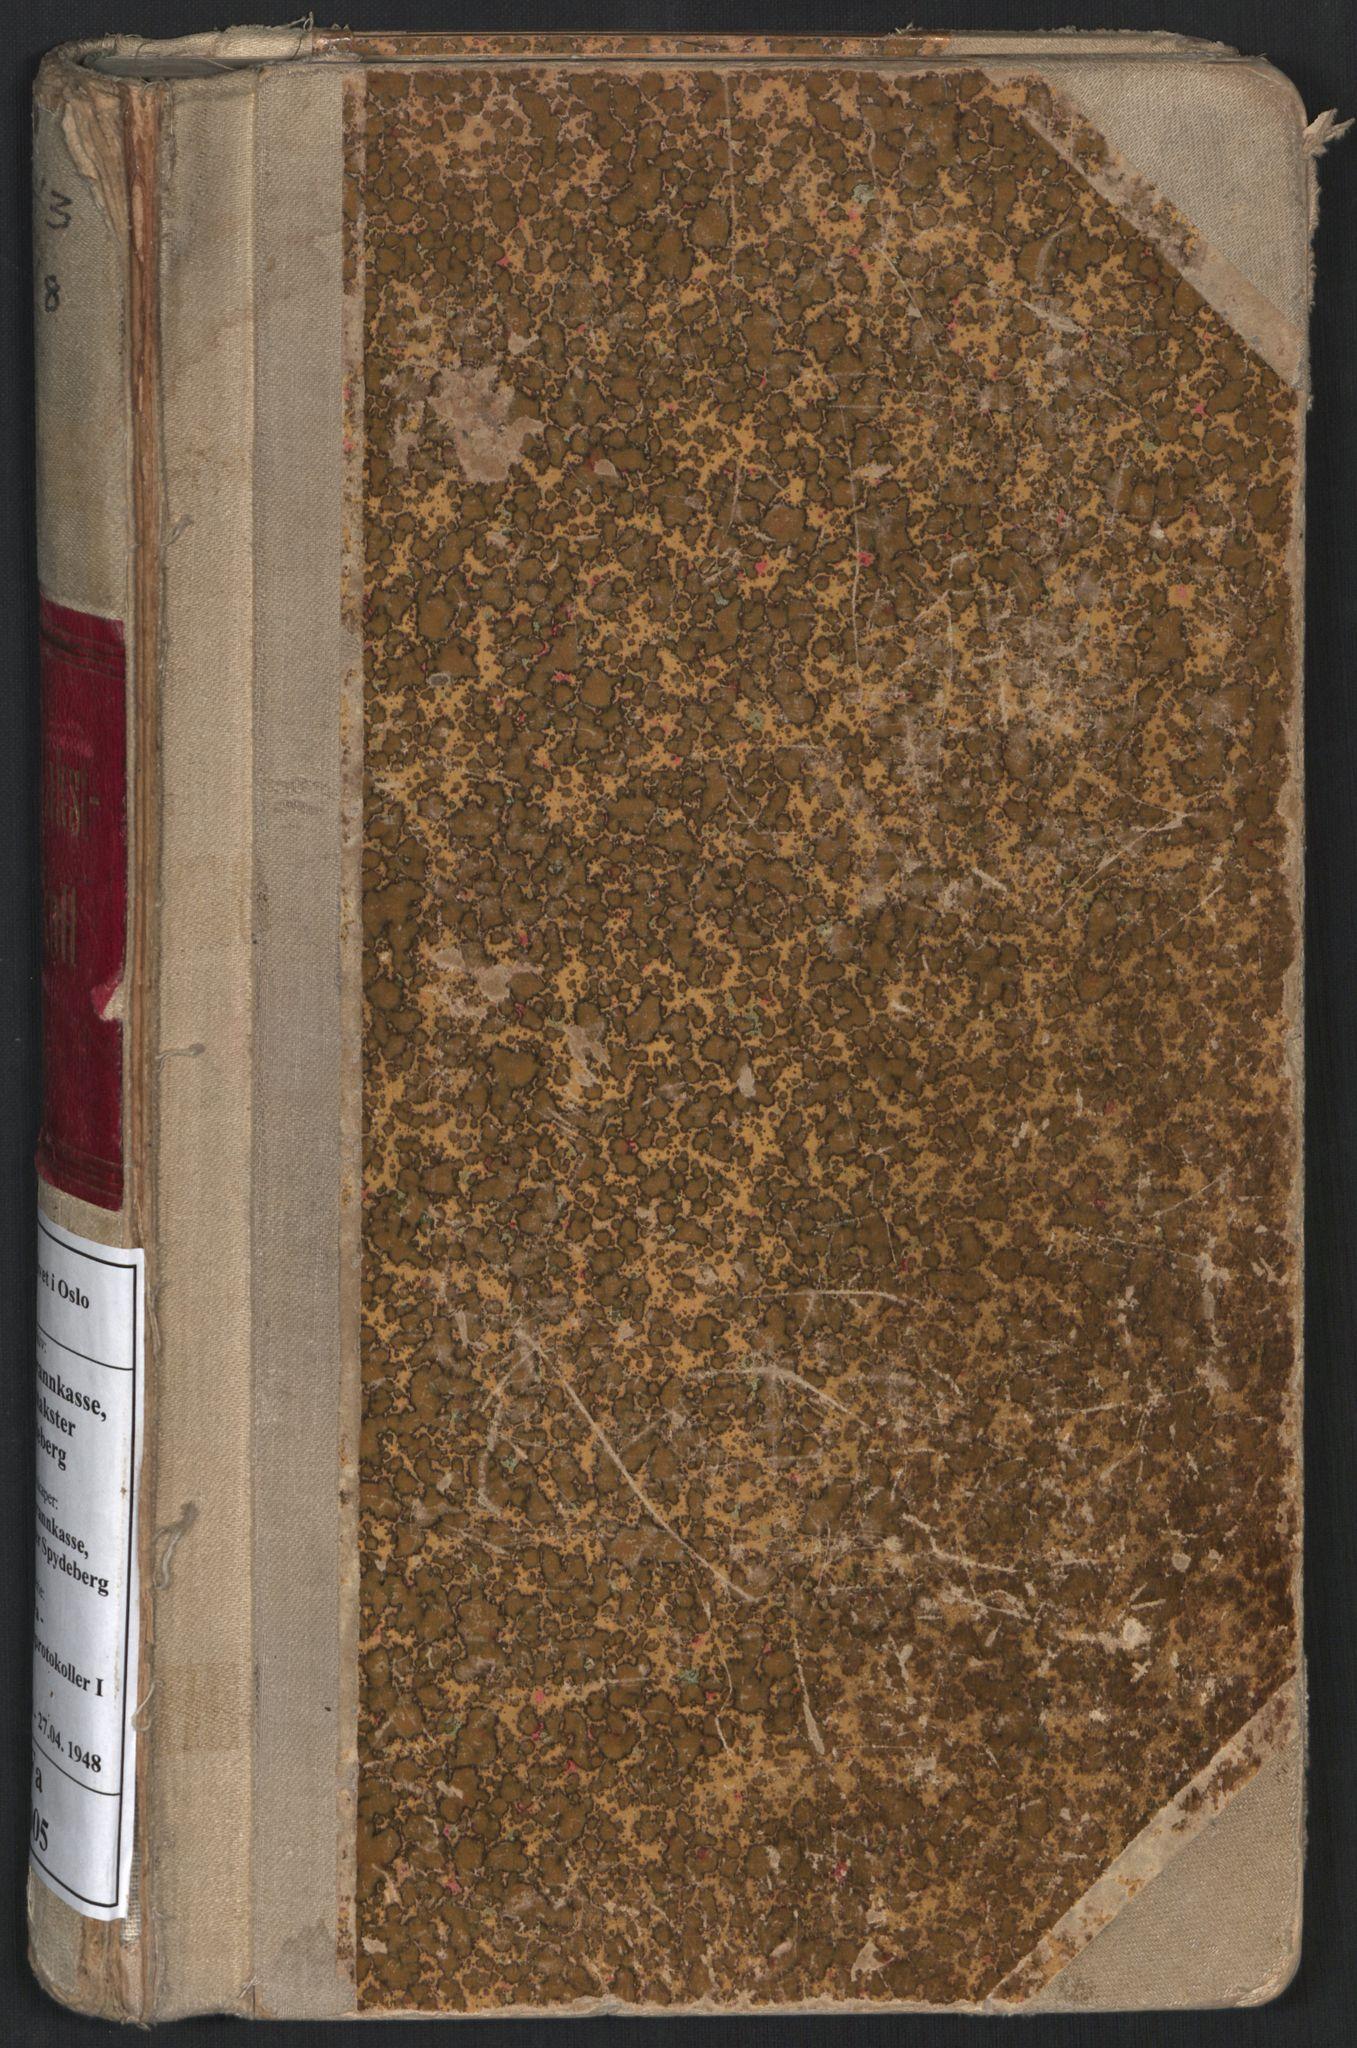 SAO, Norges brannkasse, branntakster Spydeberg, F/Fa/L0005: Branntakstprotokoll, 1943-1948